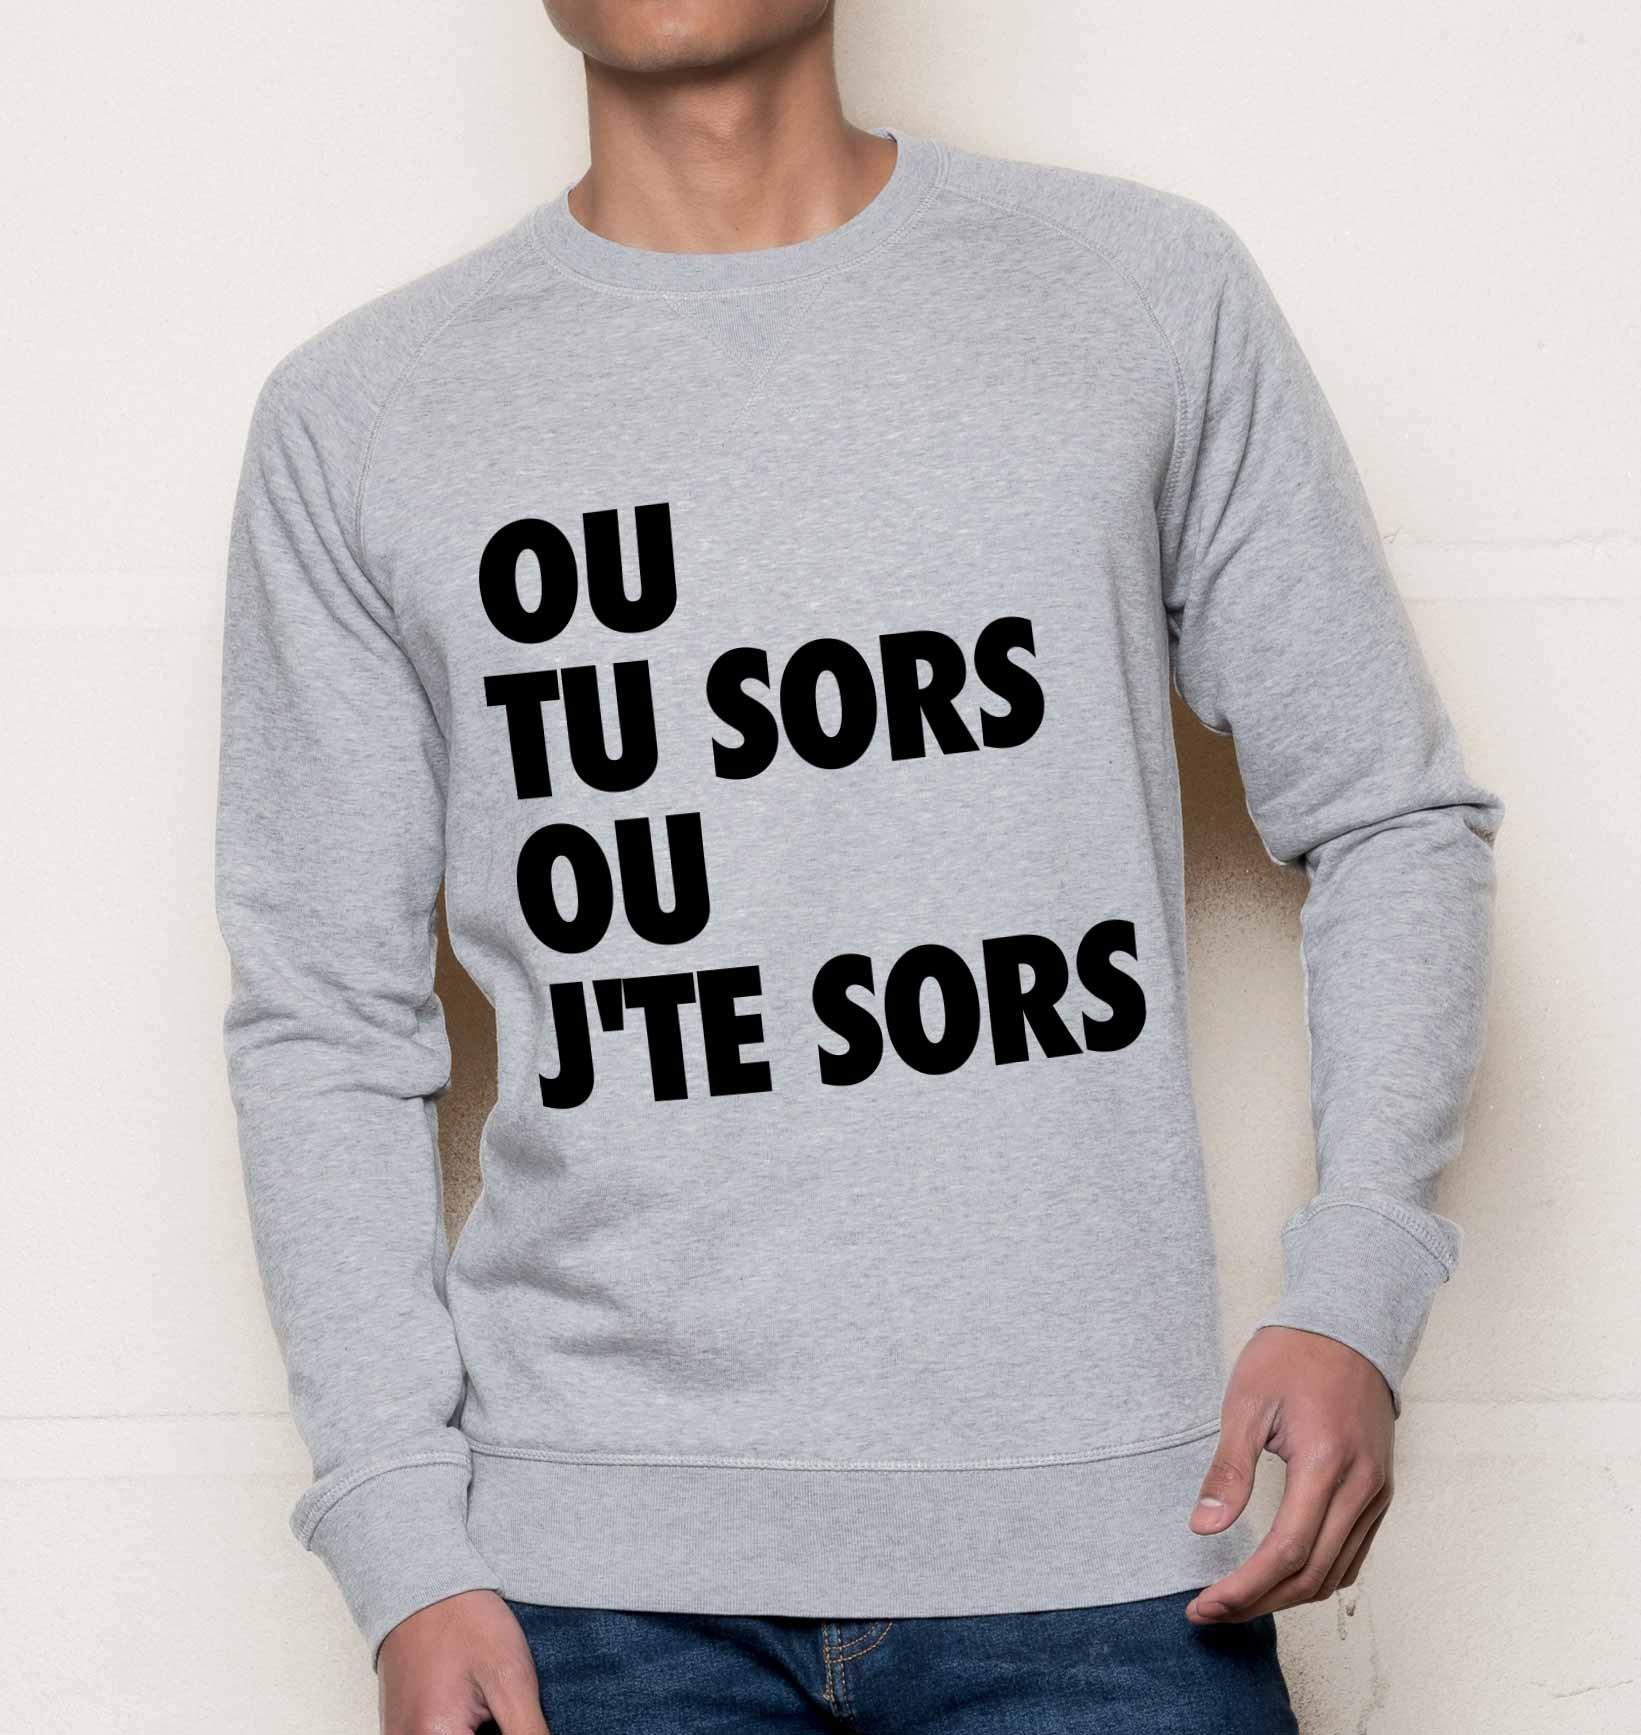 0fdb6d386 Sweat Tu Sors ou J'te Sors - Sweat Phrase Culte Dikkenek | Grafitee